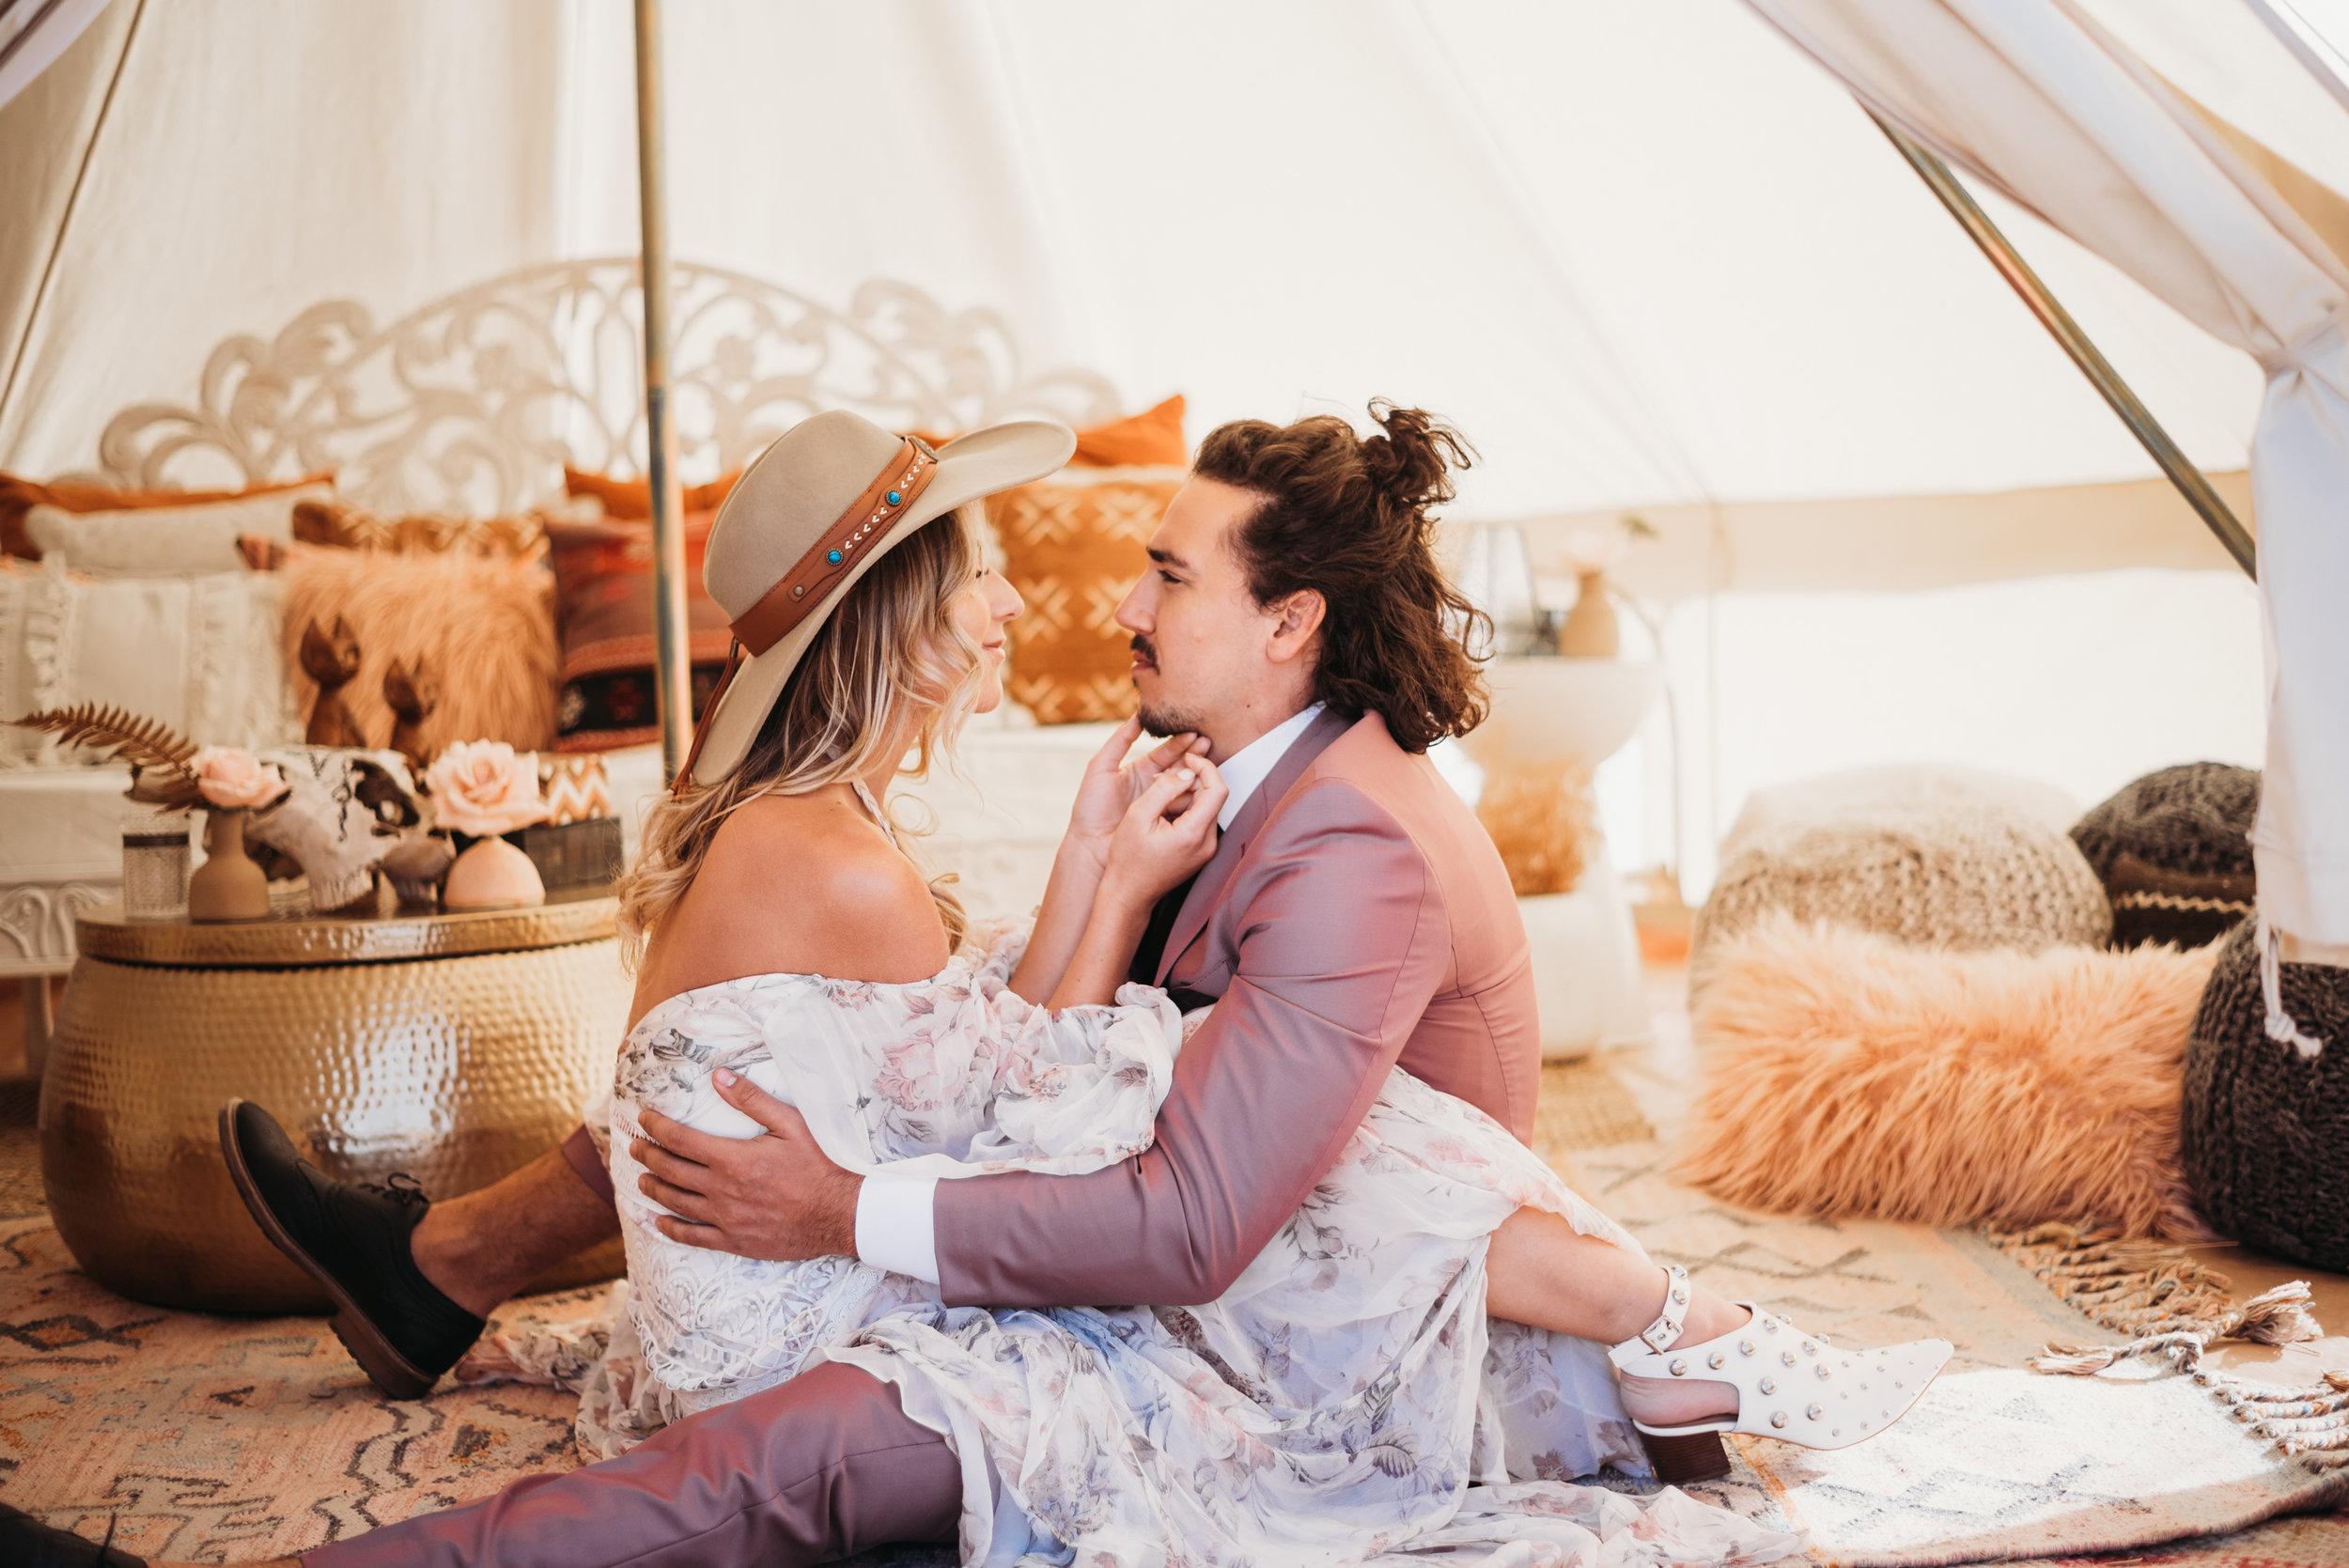 FortSt.John_photographer_TyraEPhotography_Wedding_Couple_Family_Photograhy_DawsonCreek_Elopement_Bride_Boduoir_Portraits-7185.jpg